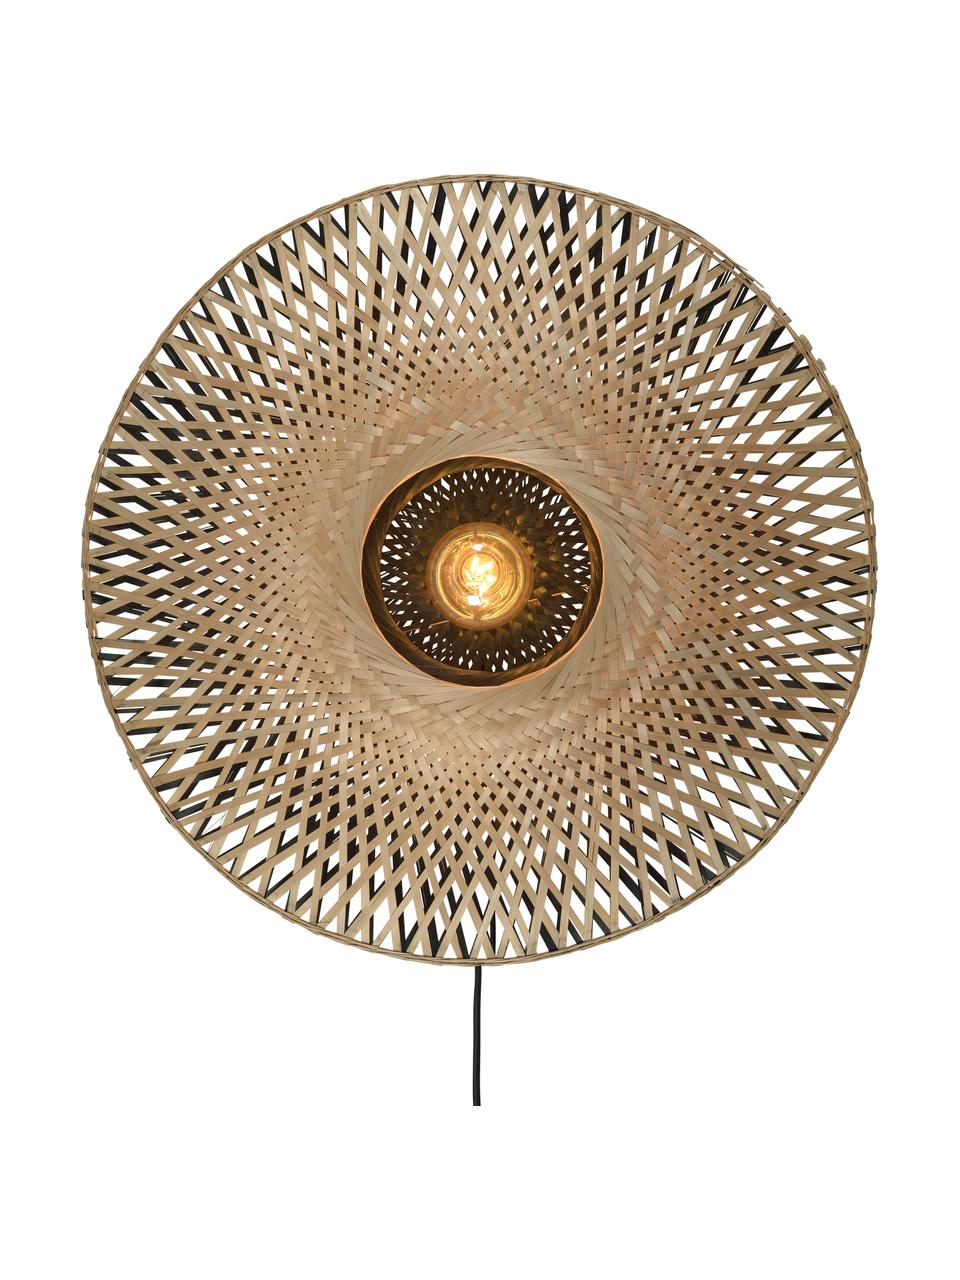 Wandleuchte Kalimantan mit Stecker aus Bambus, Lampenschirm: Bambus, Bambus, Schwarz, Ø 60 x T 15 cm